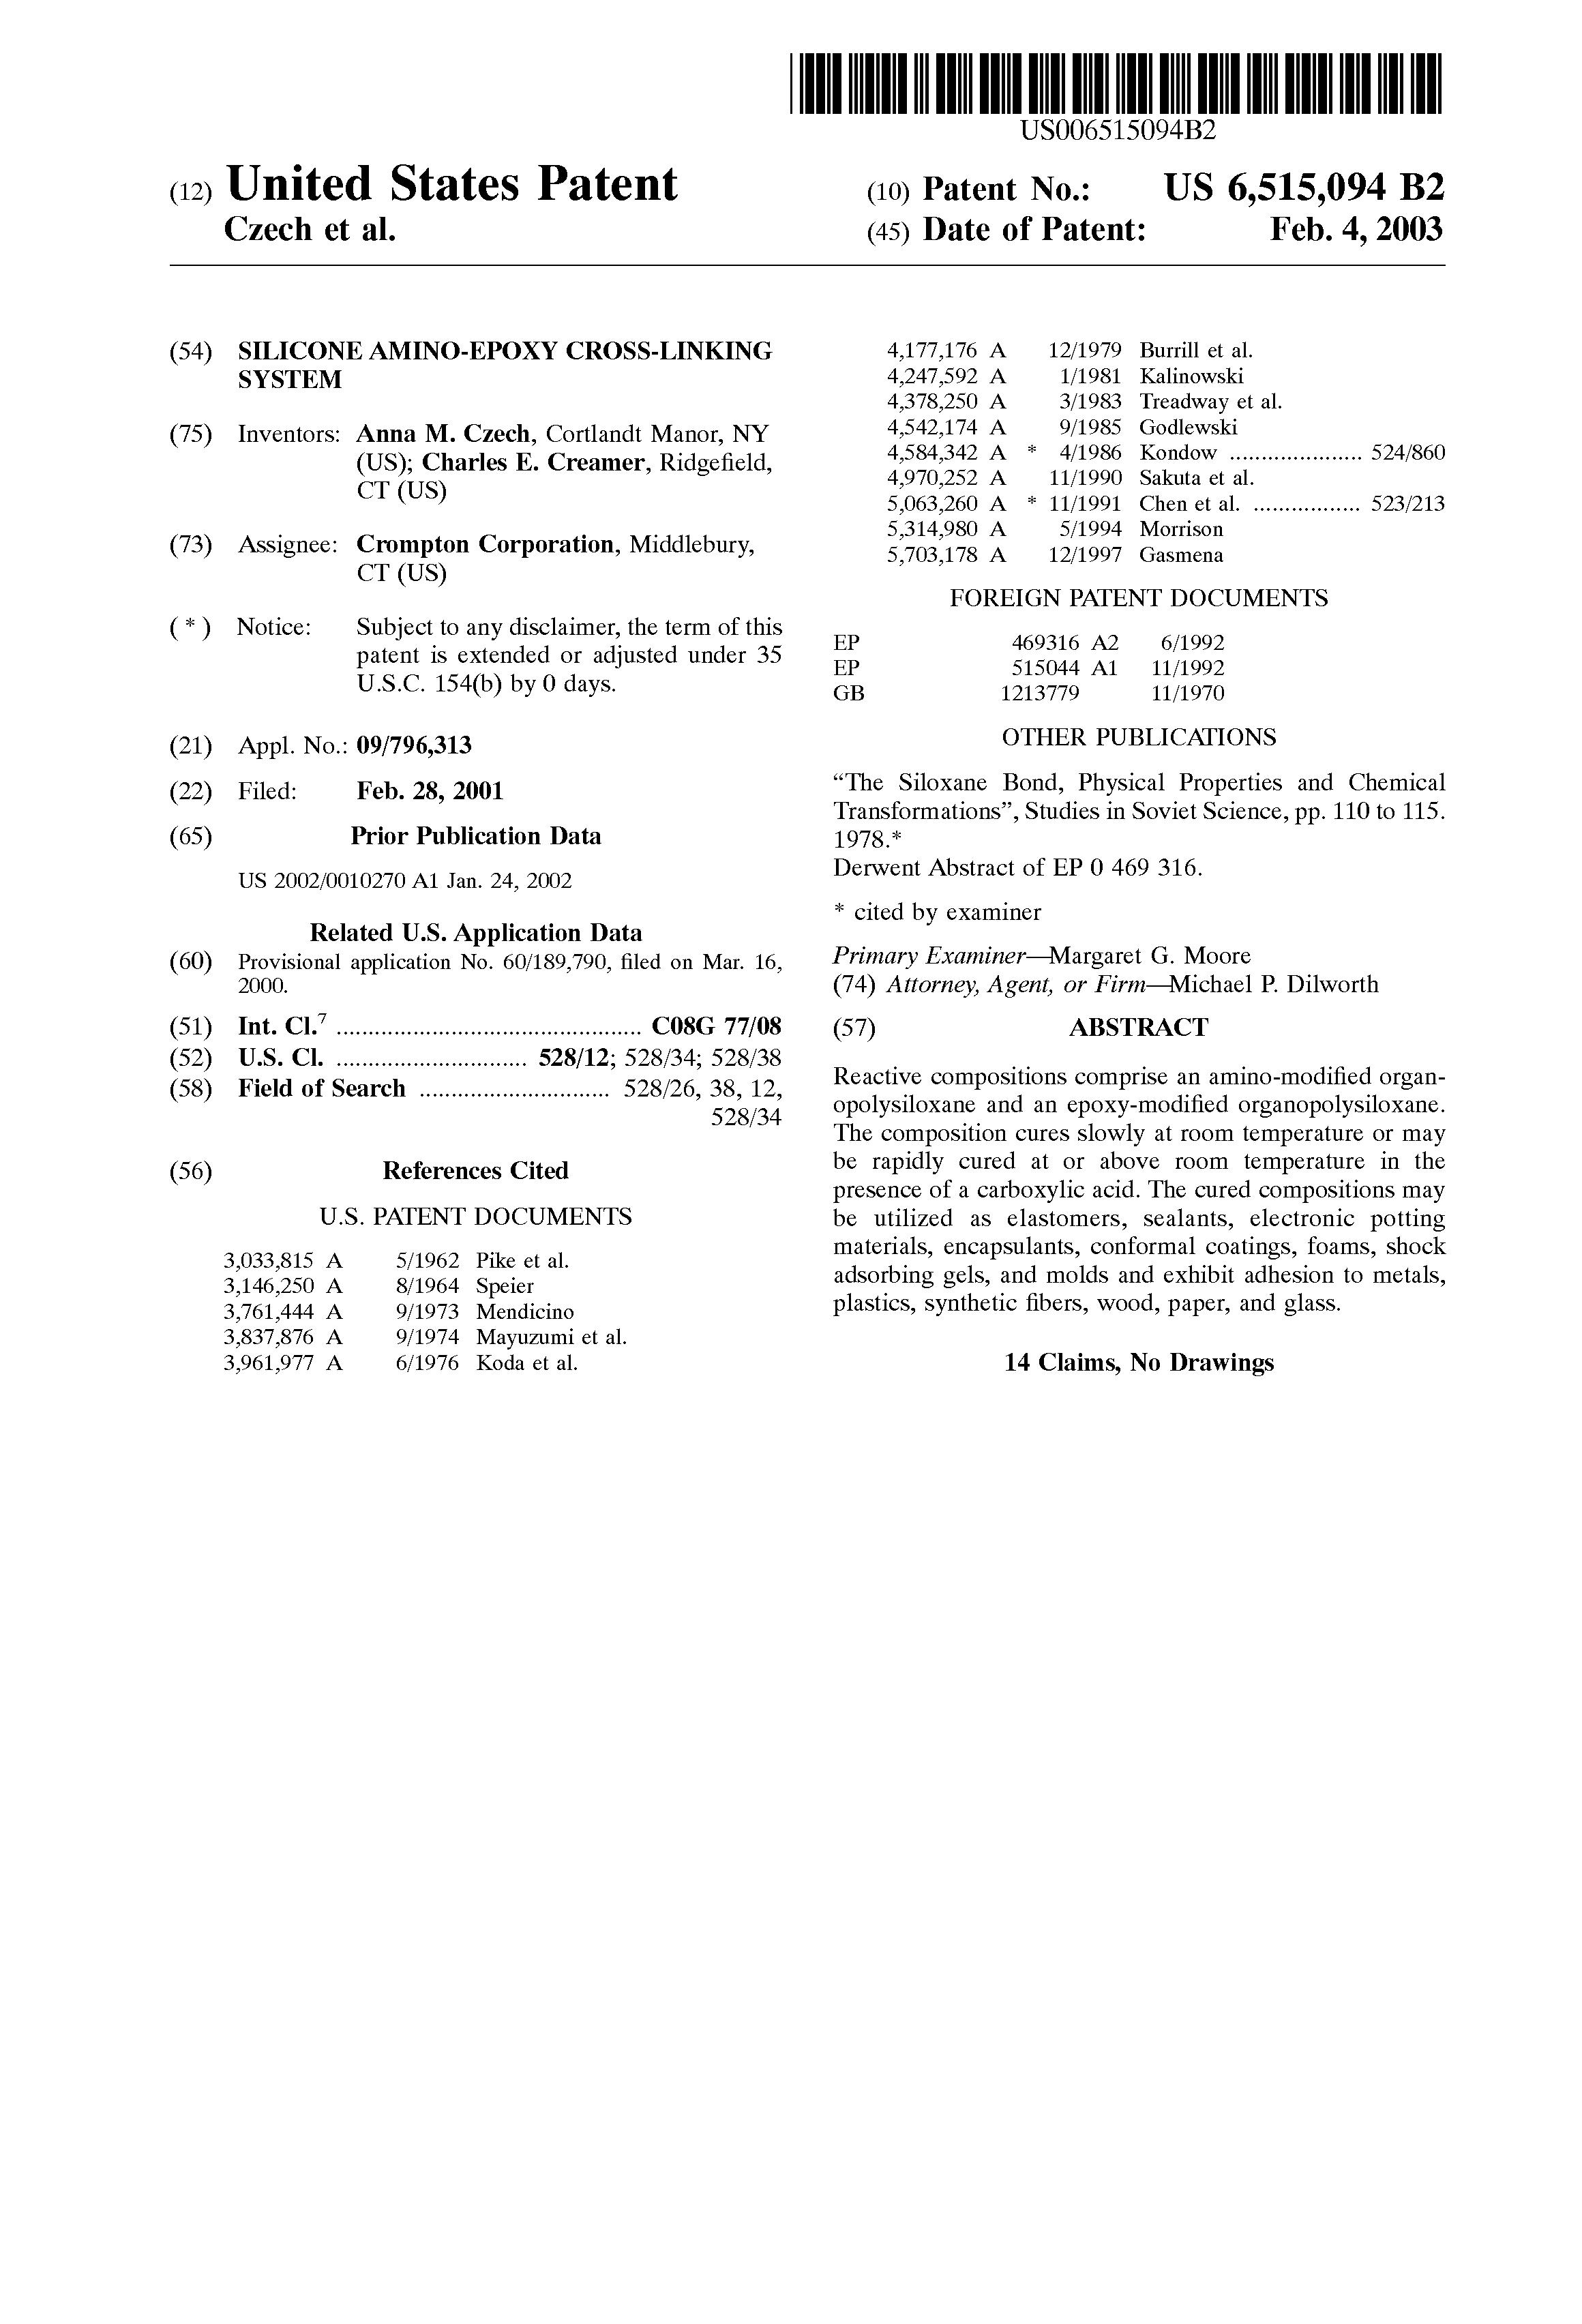 Patent US6515094 - Silicone amino-epoxy cross-linking system